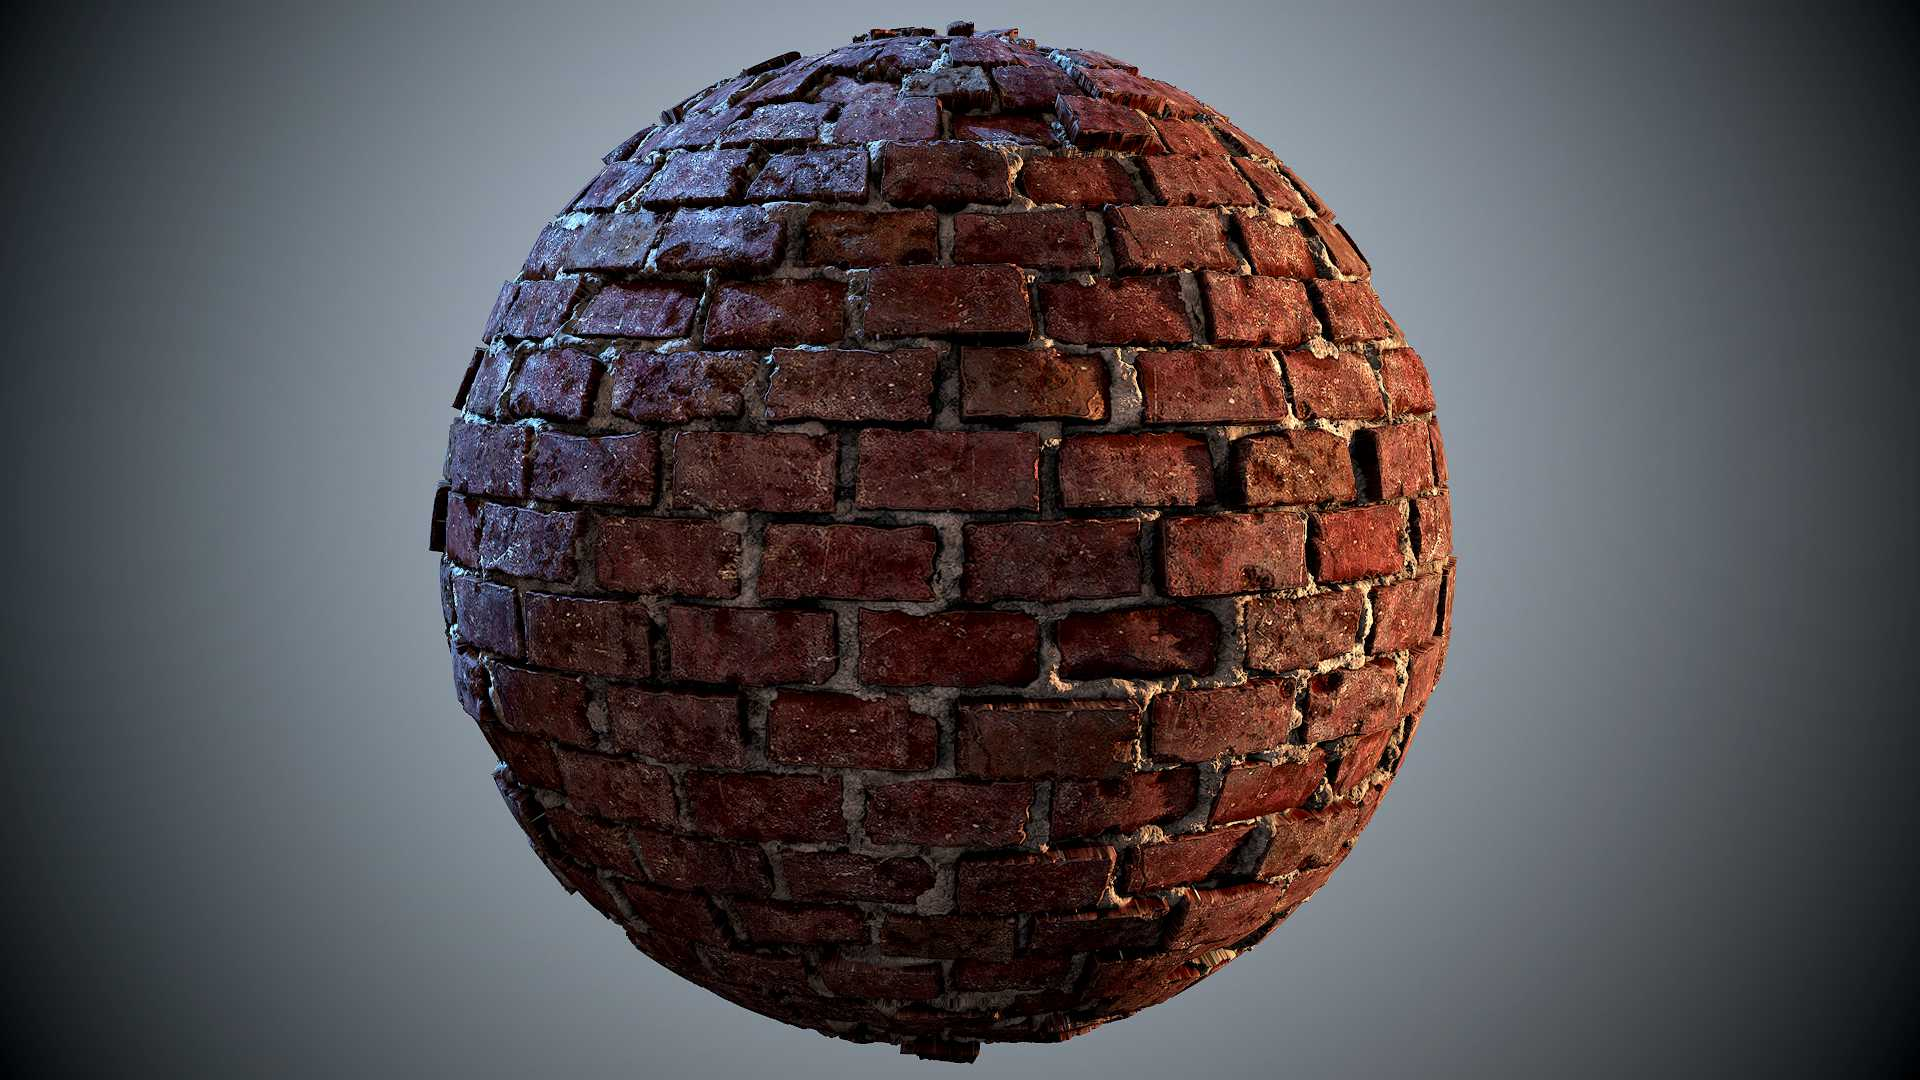 Sculpting A Brick Wall Texture The Classical Way